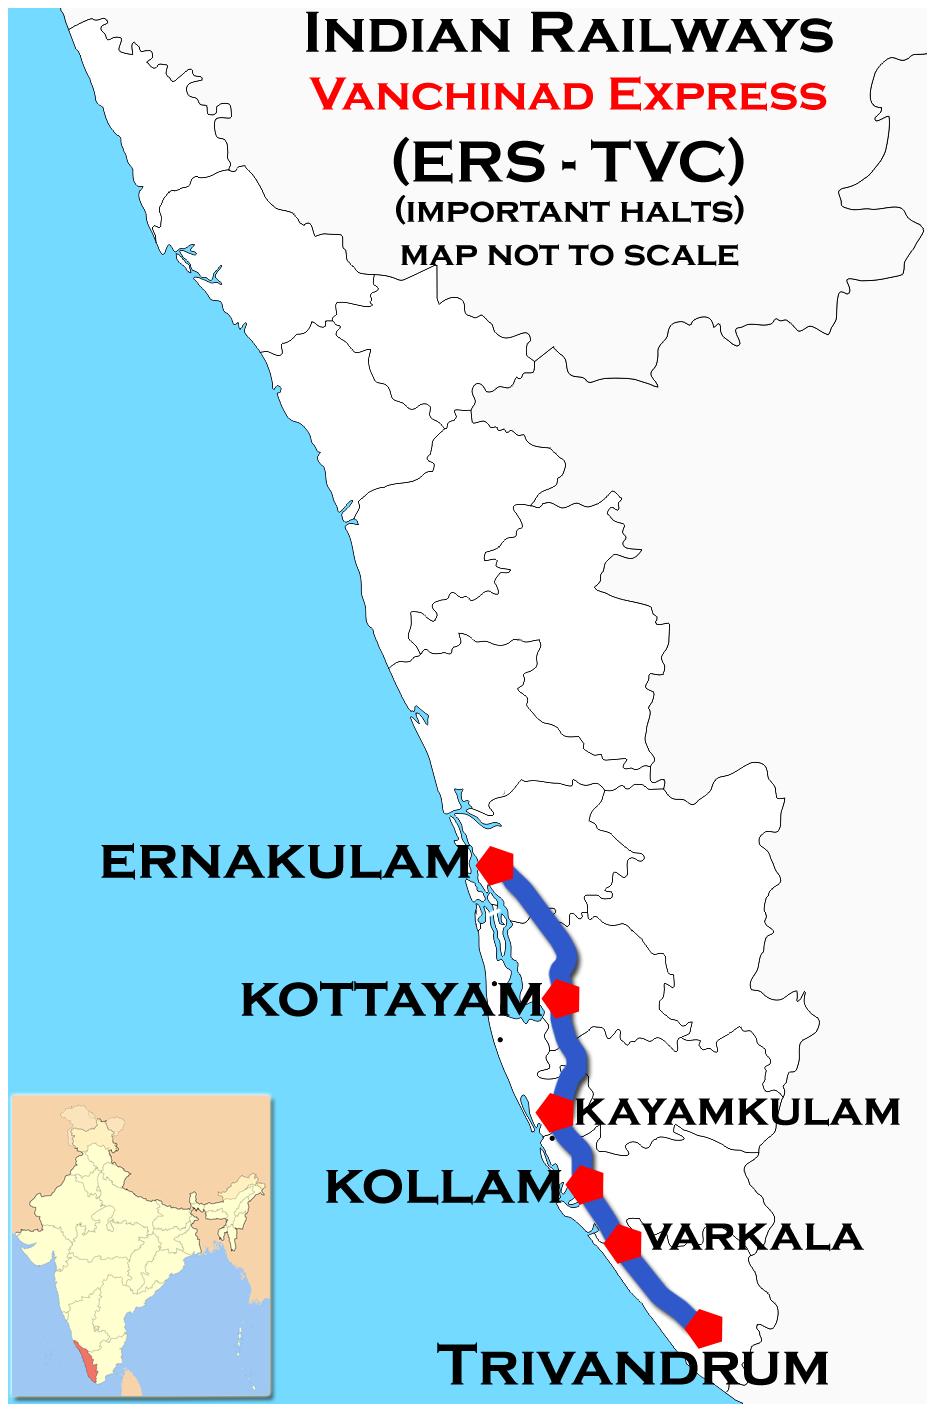 Vanchinad Express (Ernakulam – Trivandrum) route map